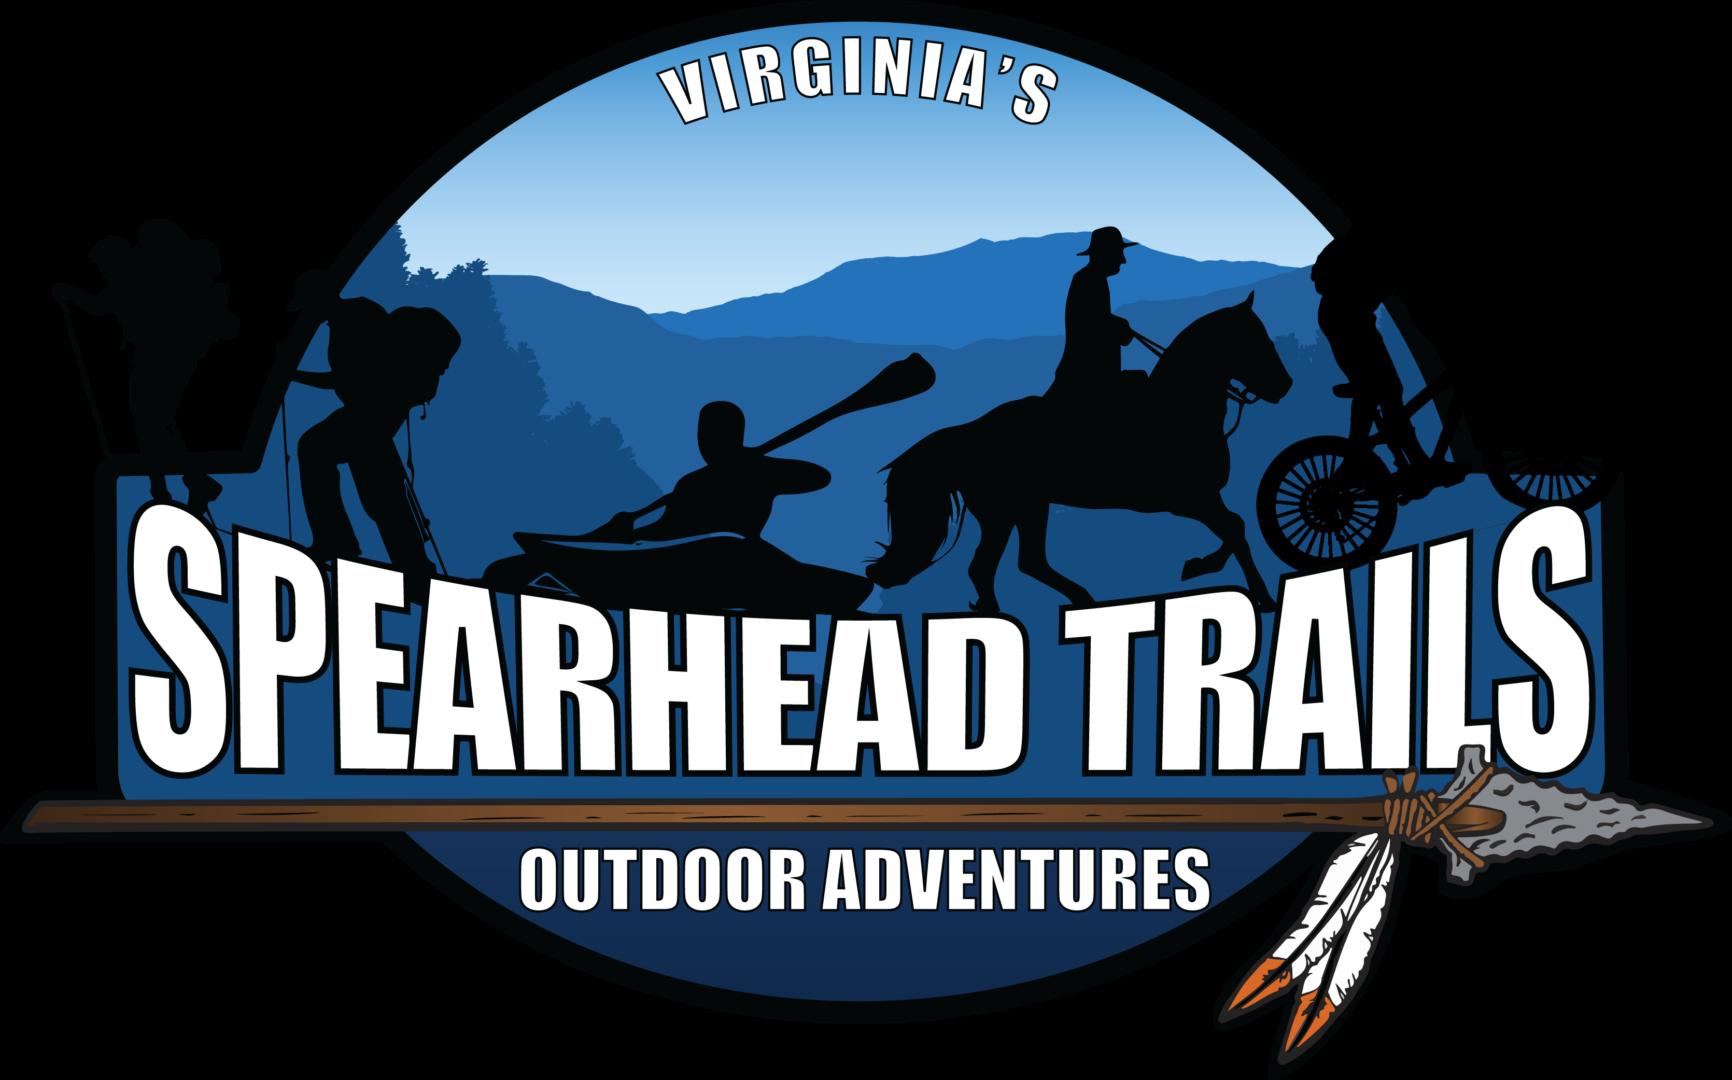 https://spearheadtrails.com/wp-content/uploads/2020/05/SpearheadLogoOutdoors.png